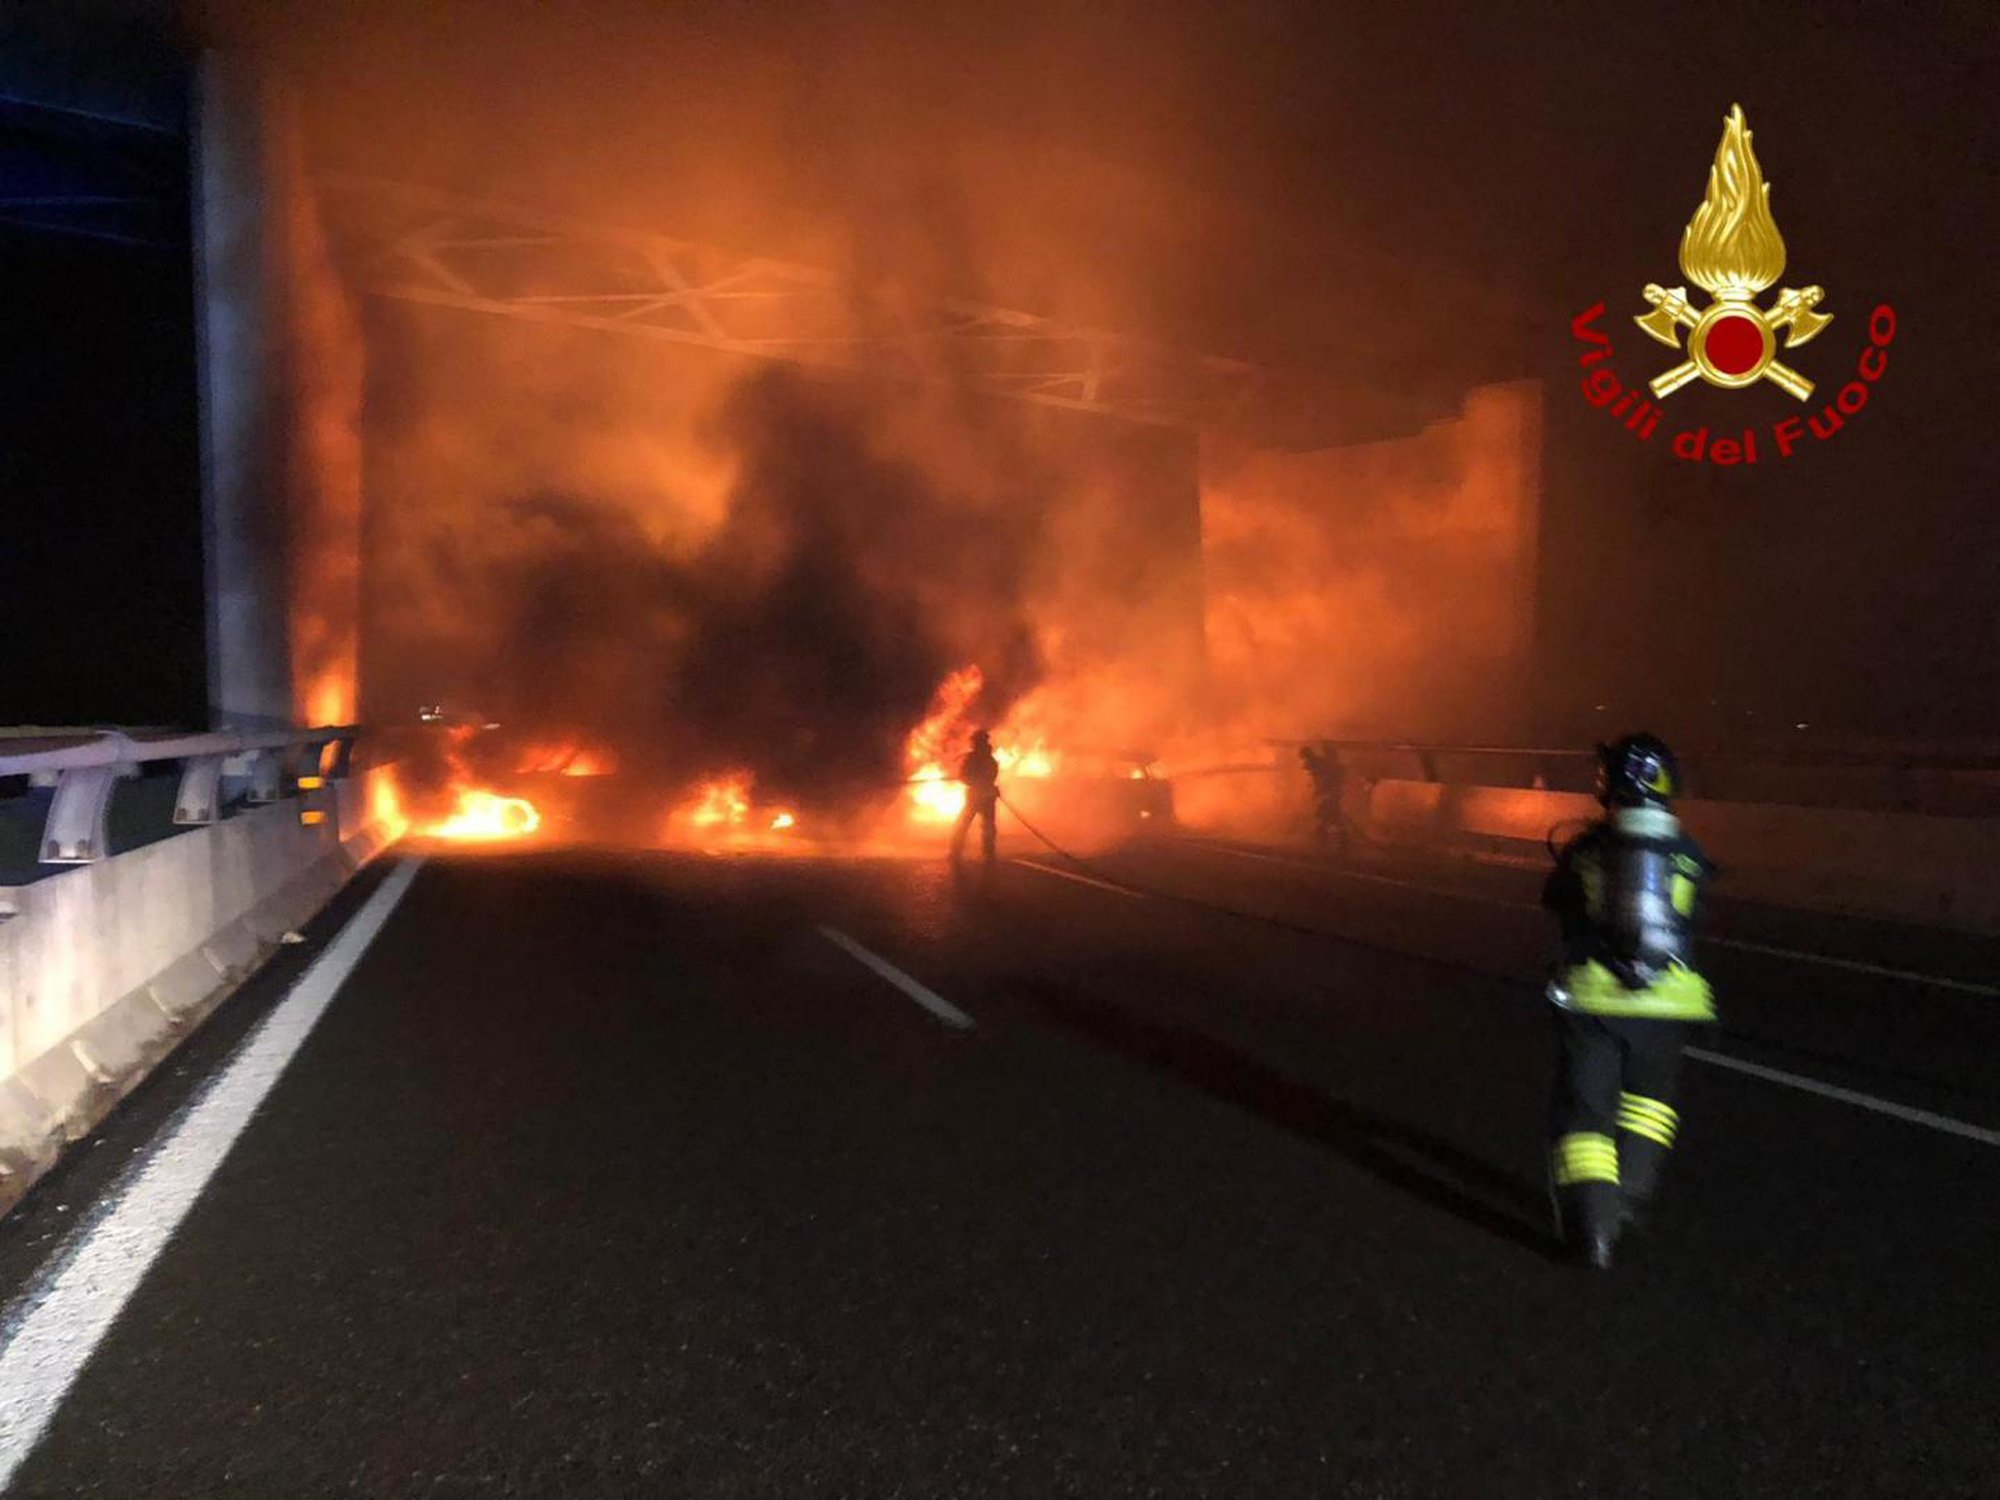 A failed Italian job: Driver evades flaming highway robbery